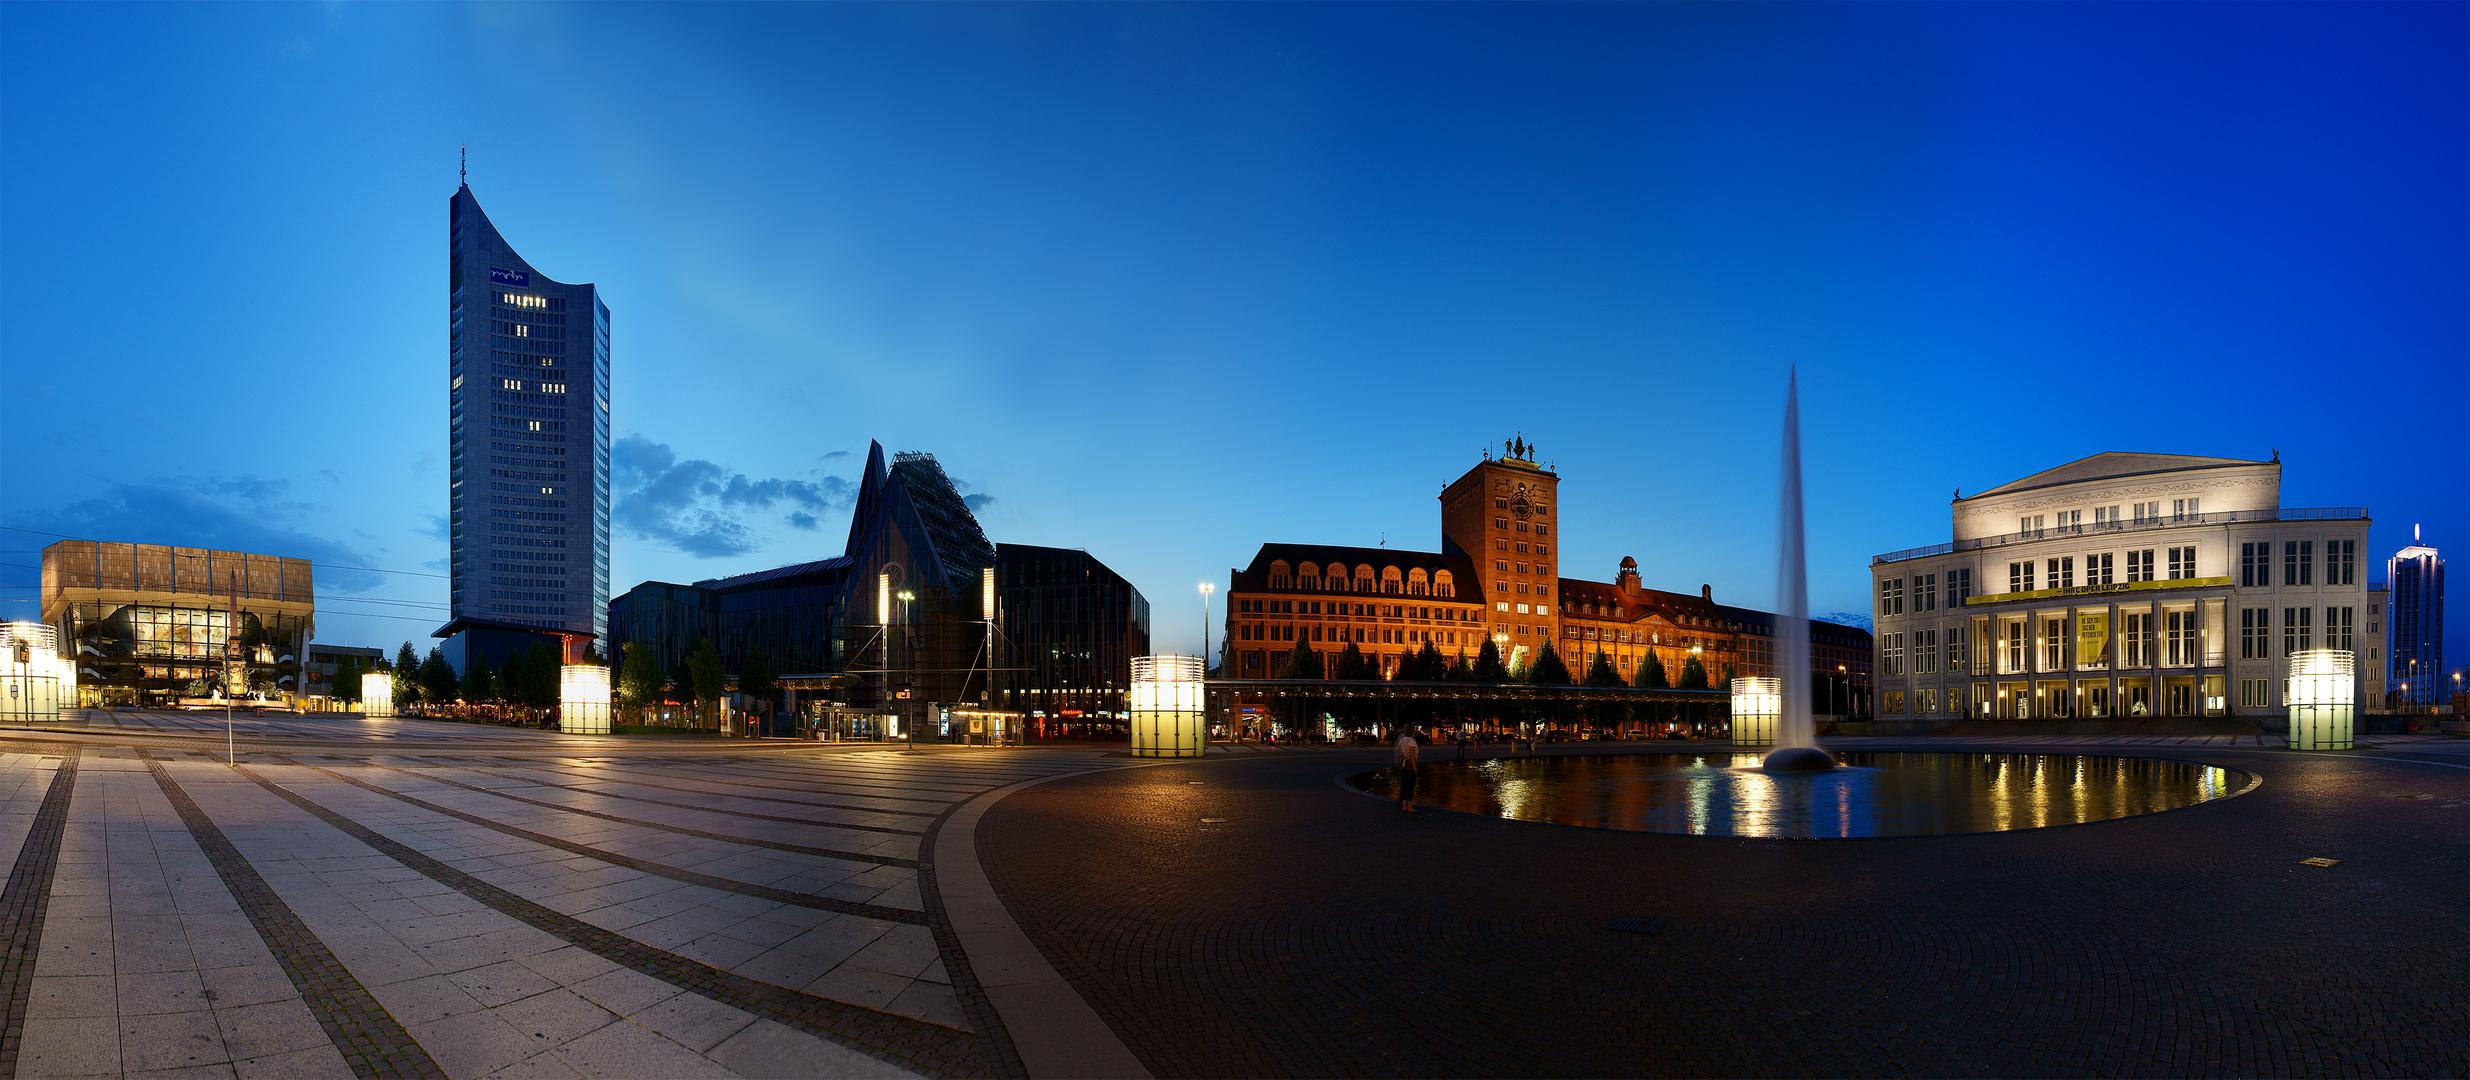 Augustusplatz in Leipzig